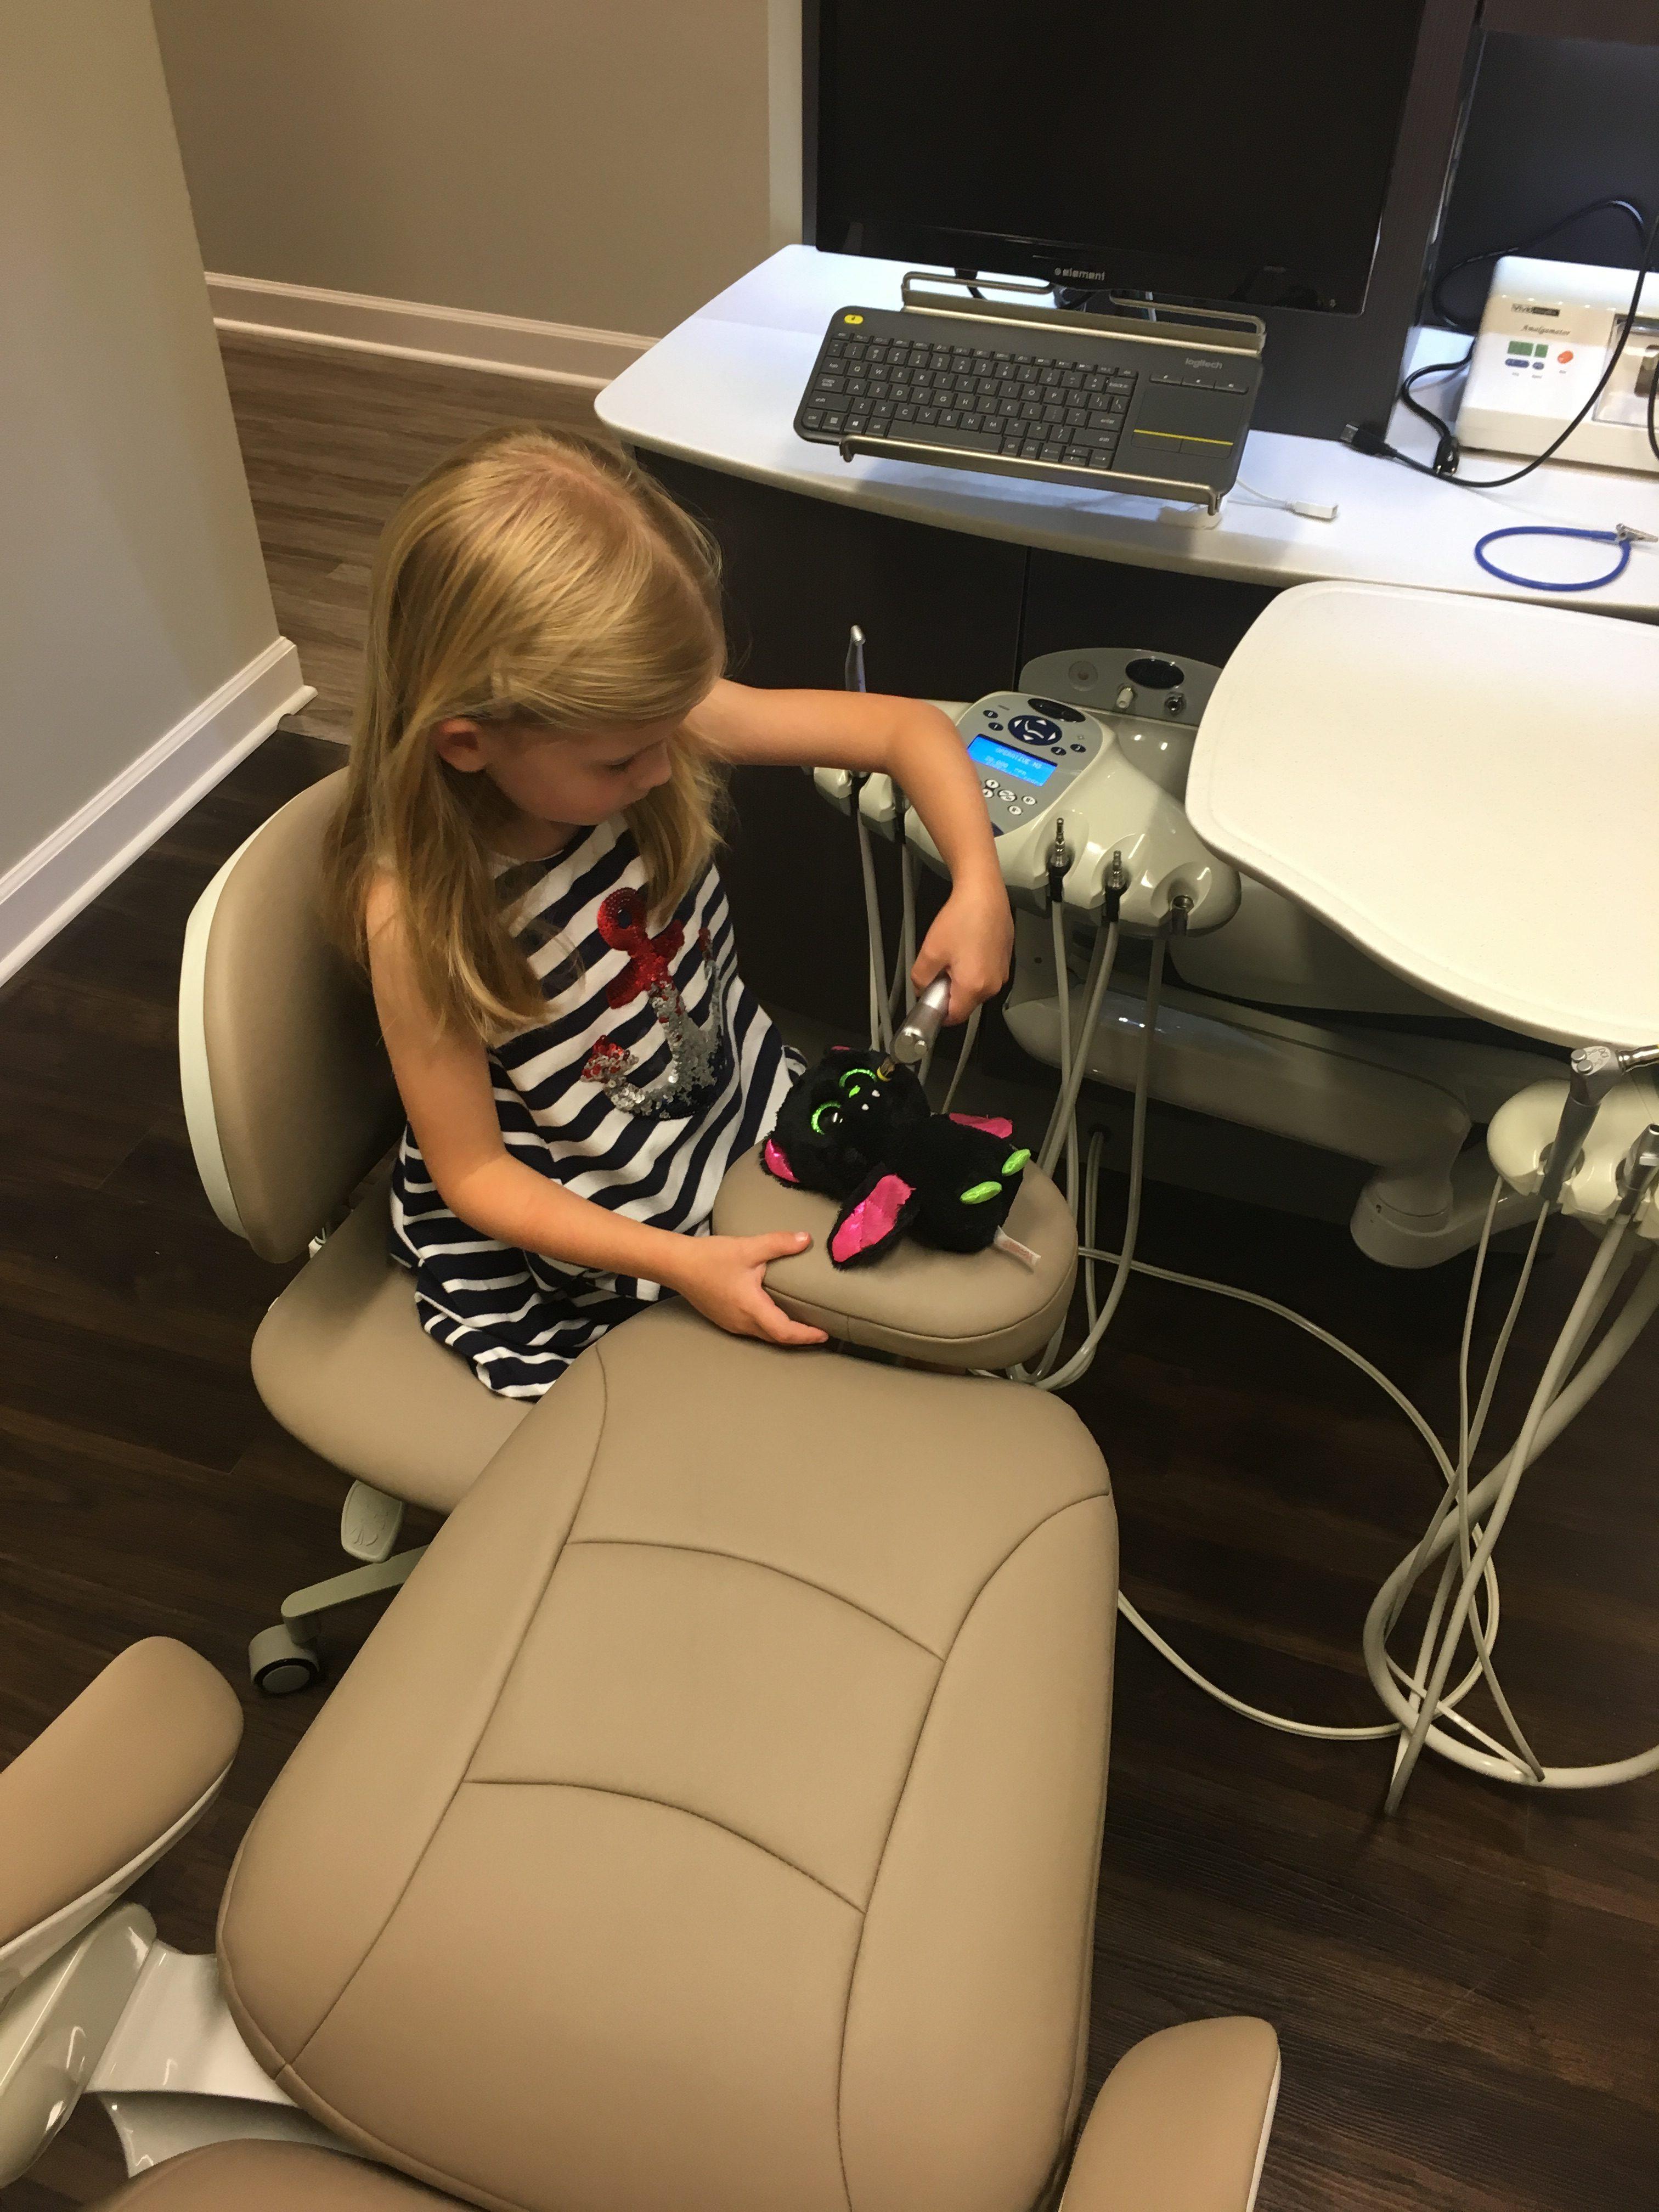 Dental Check Up, Greenville Dental Studio, Dental Health, Cosmetic Dental